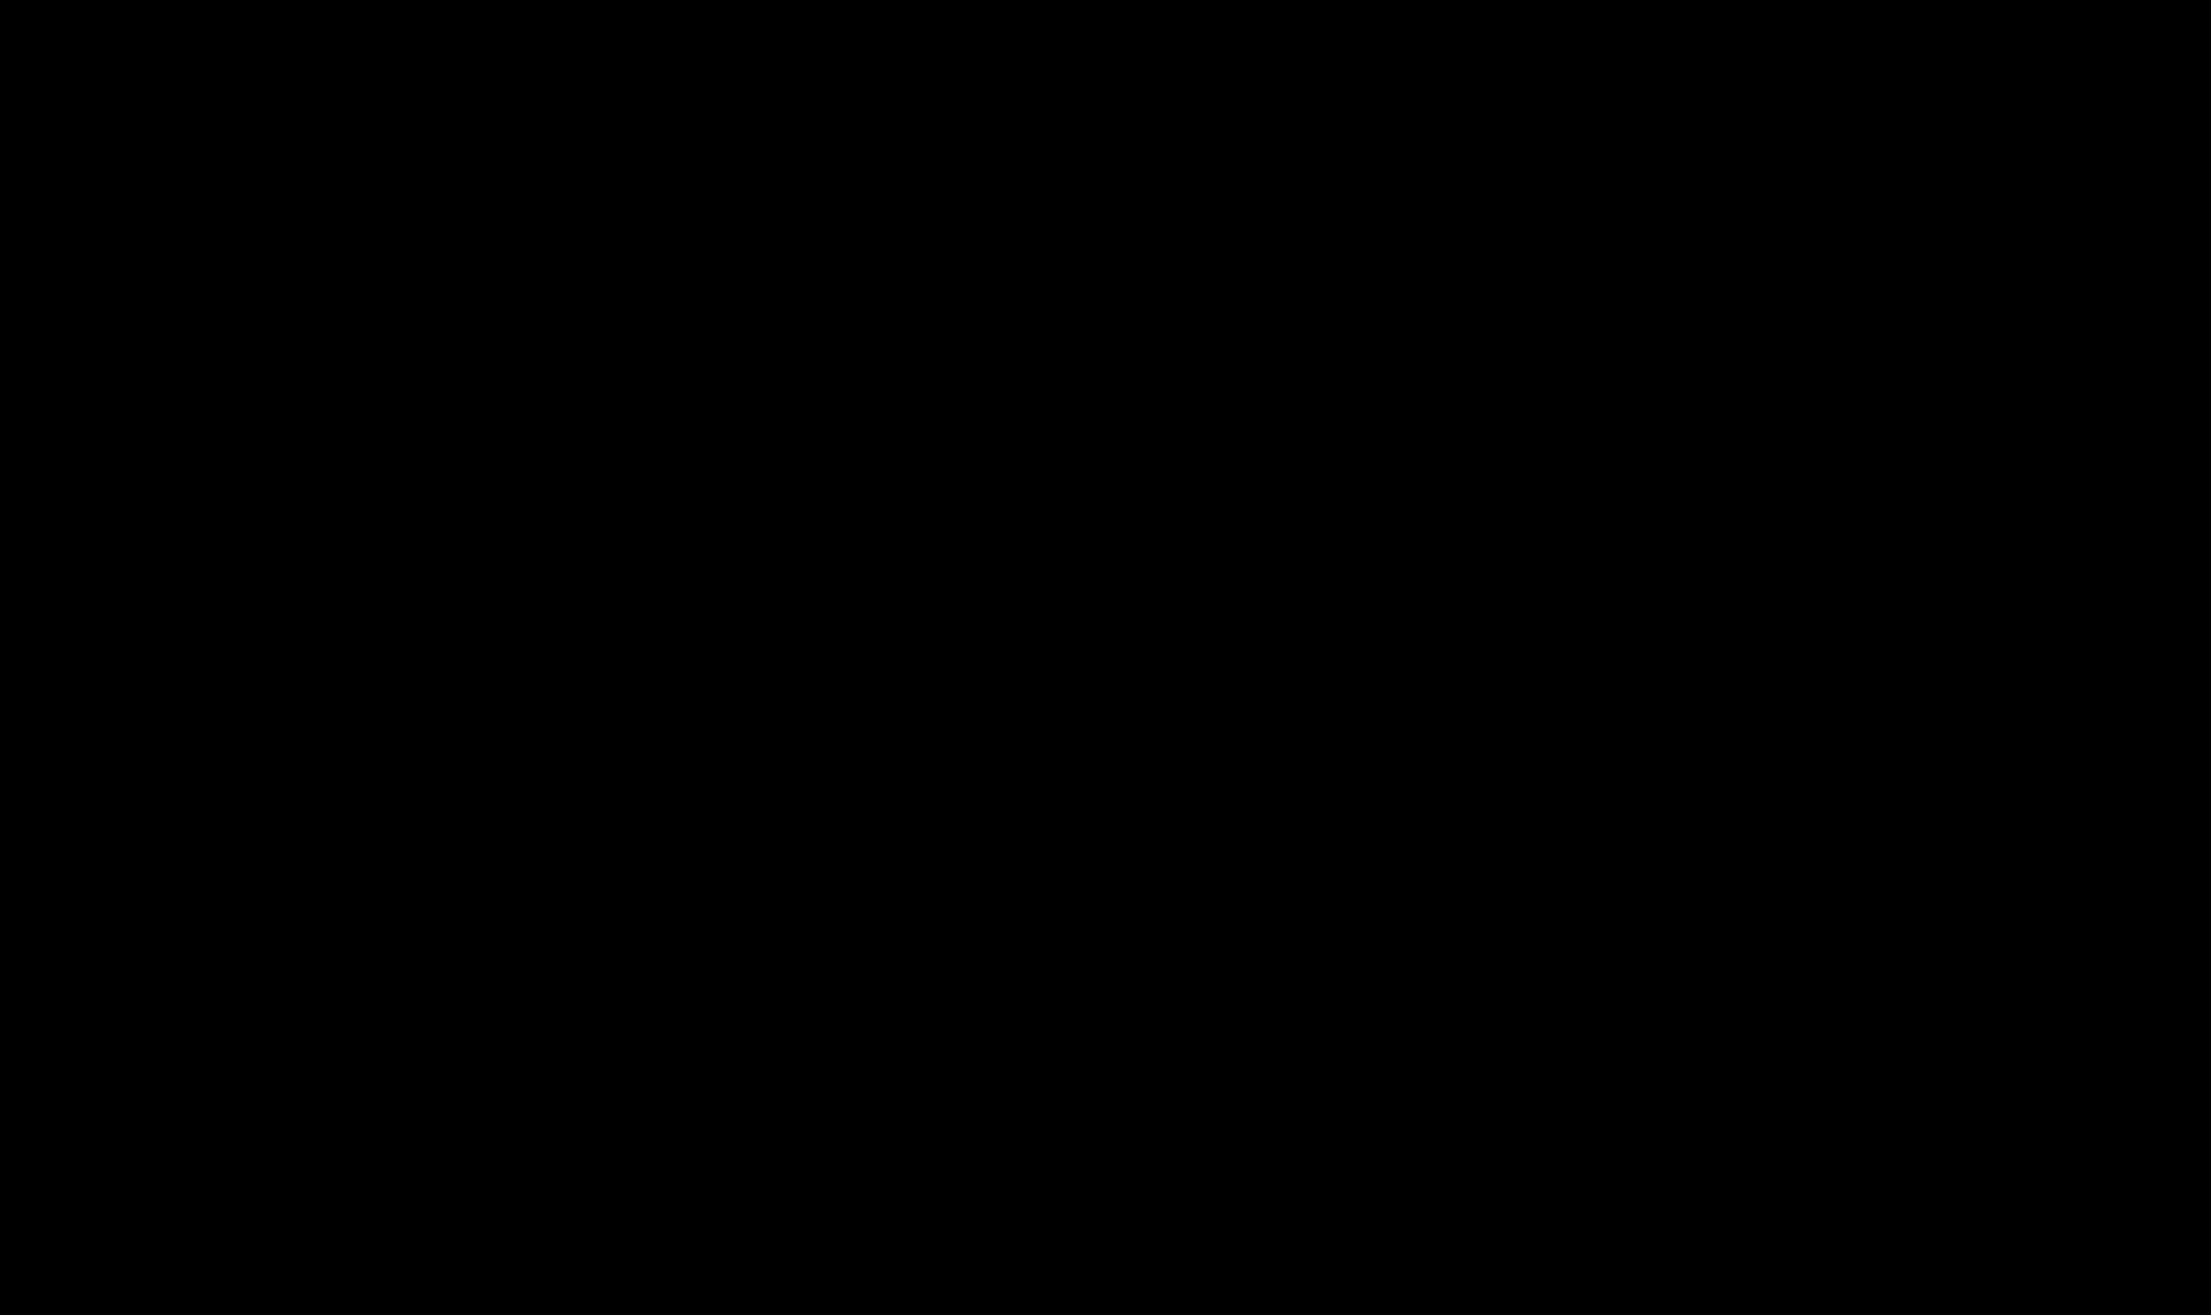 Tetra(-amido-dPEG®₂₃-MAL)pentaerythritol